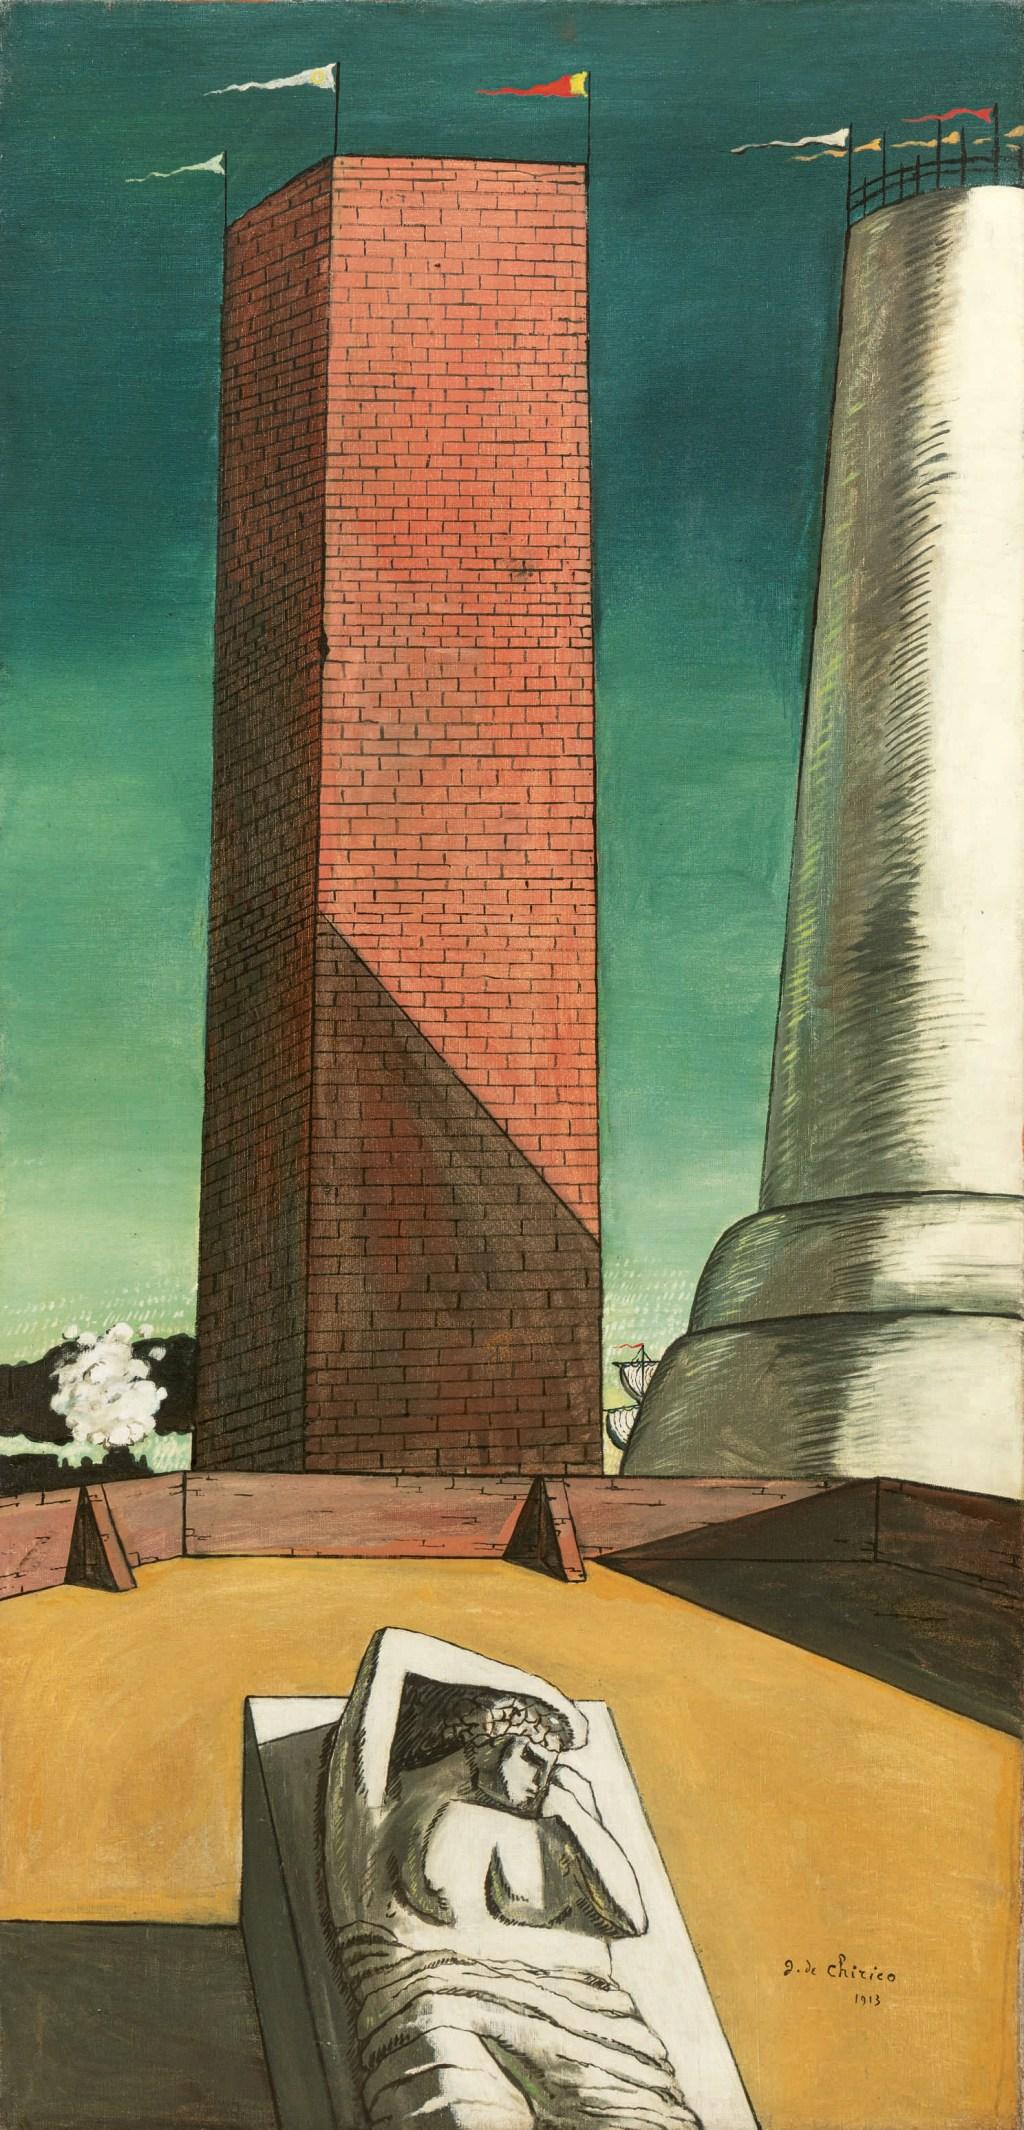 Giorgio de Chirico, Man Ray Works Could Break Records in Sotheby's Sale